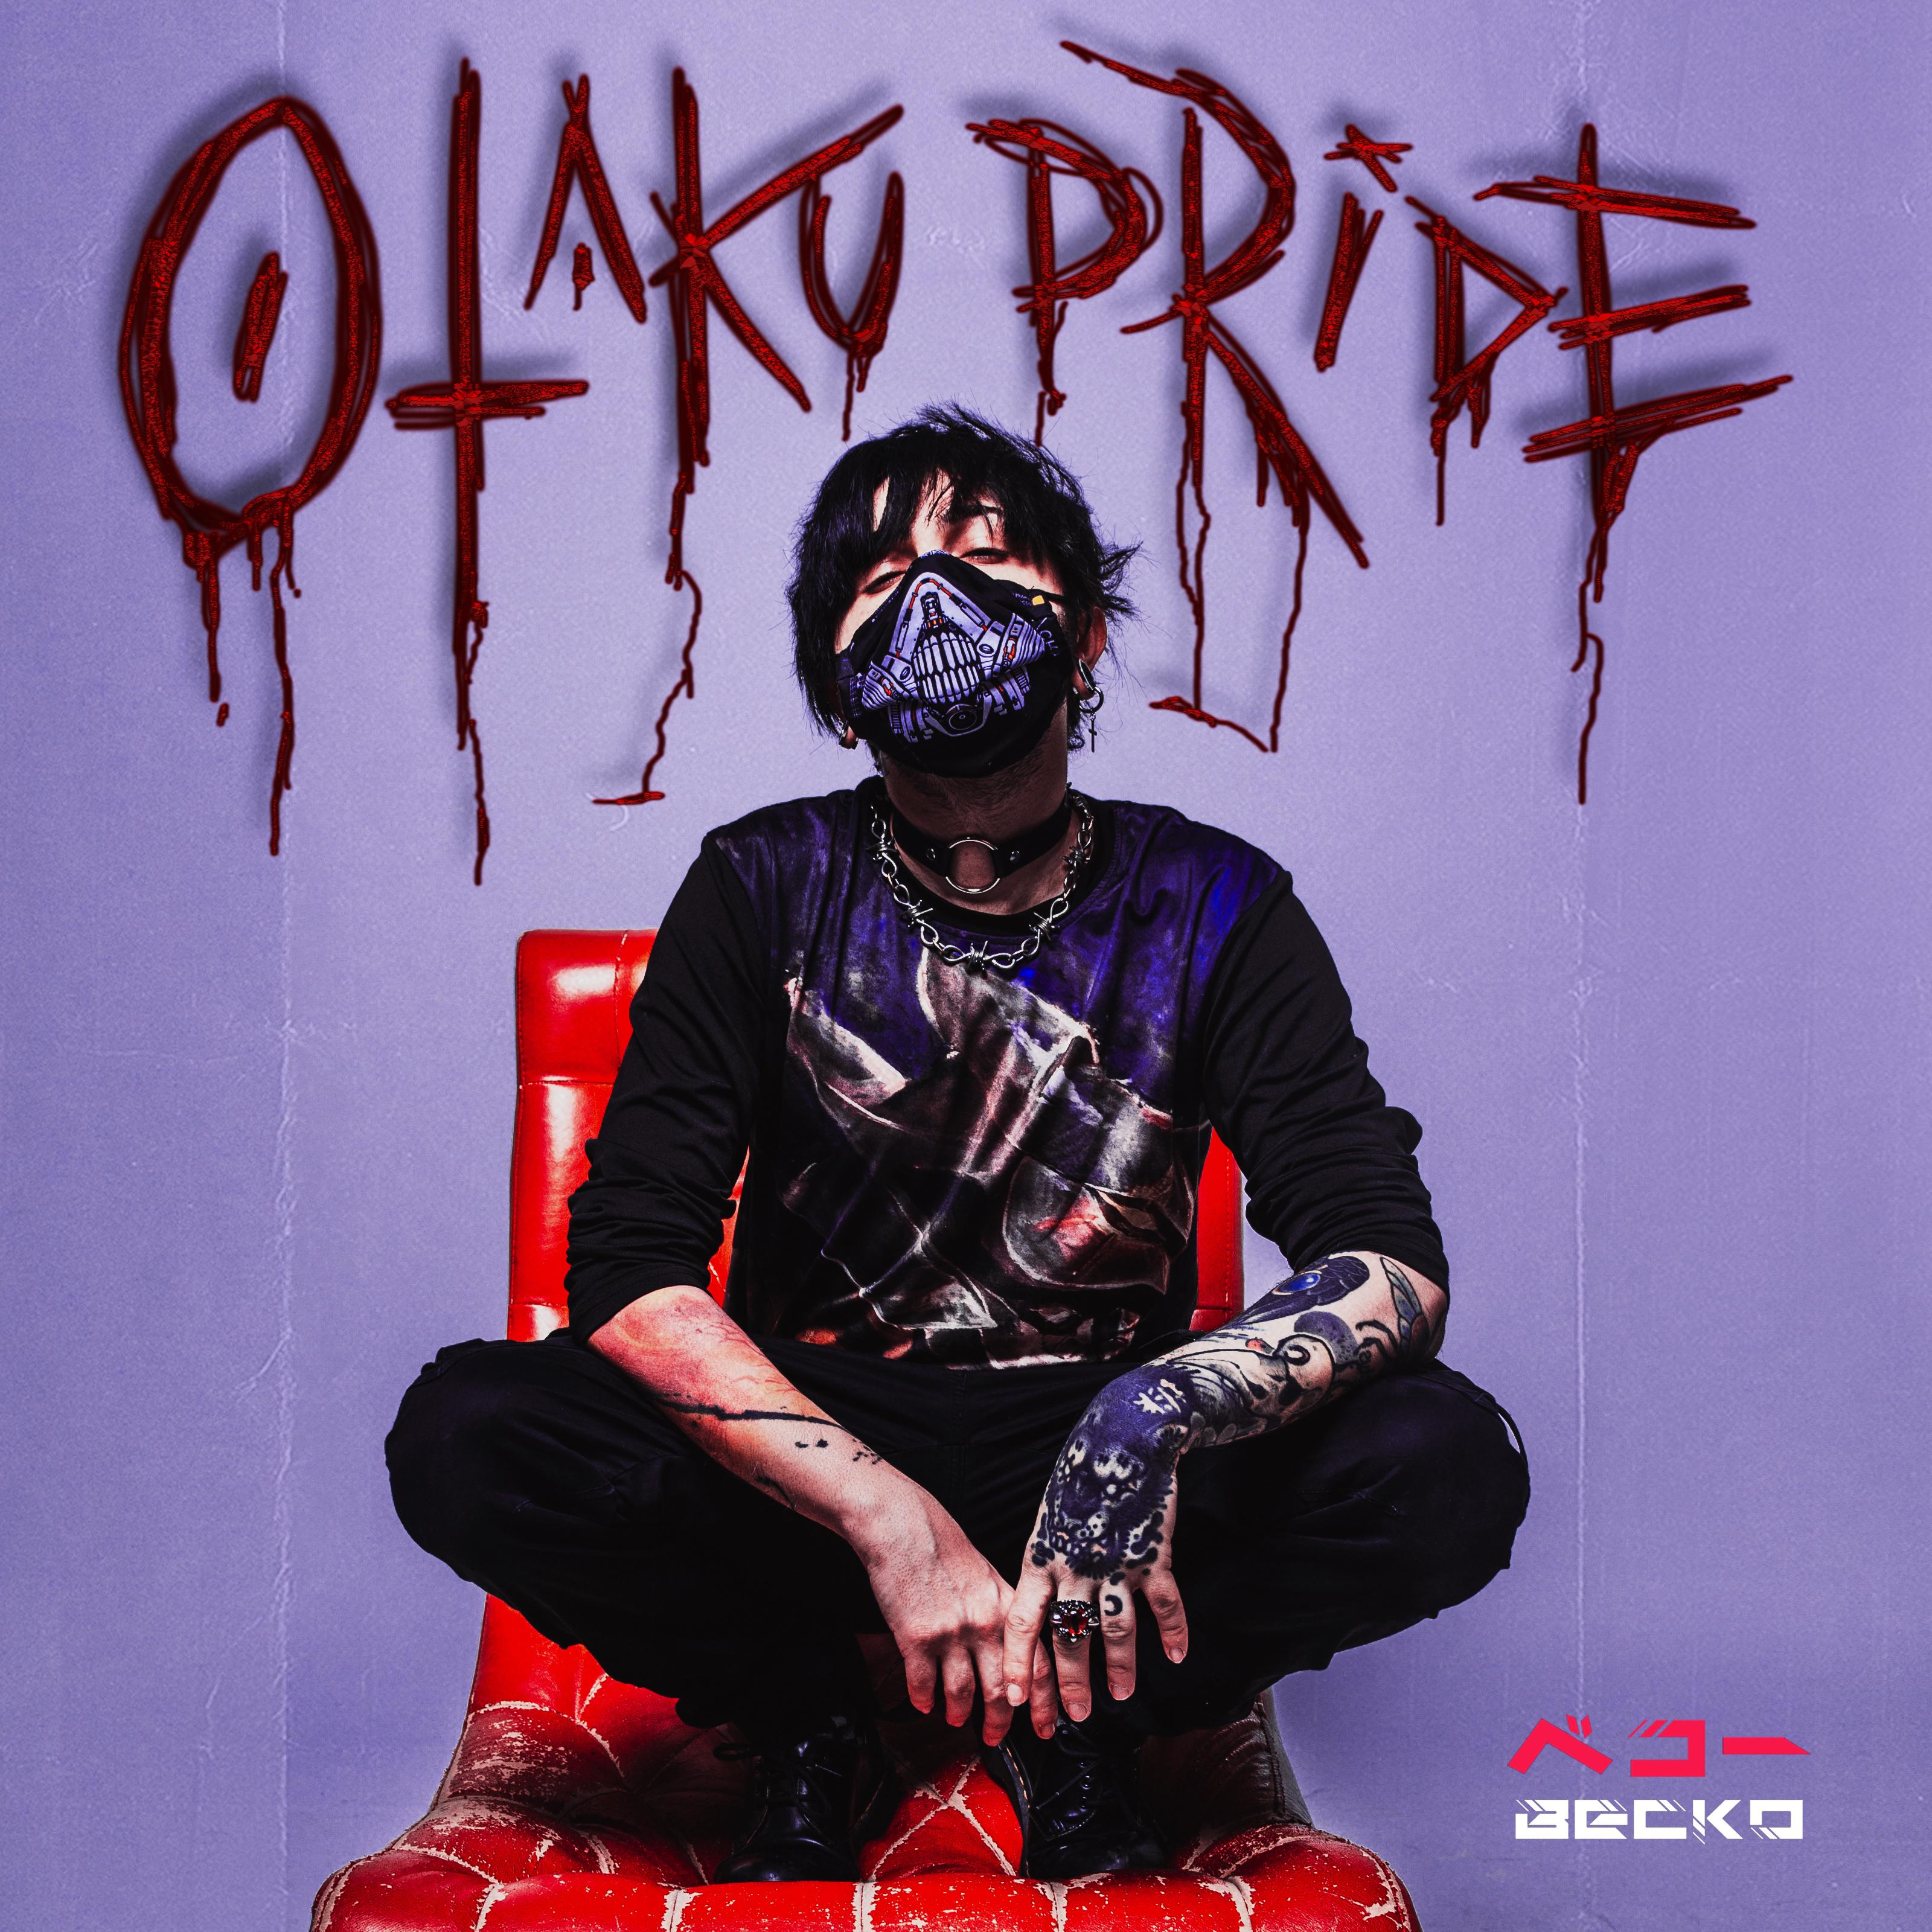 Becko - Otaku Pride (Single) Image